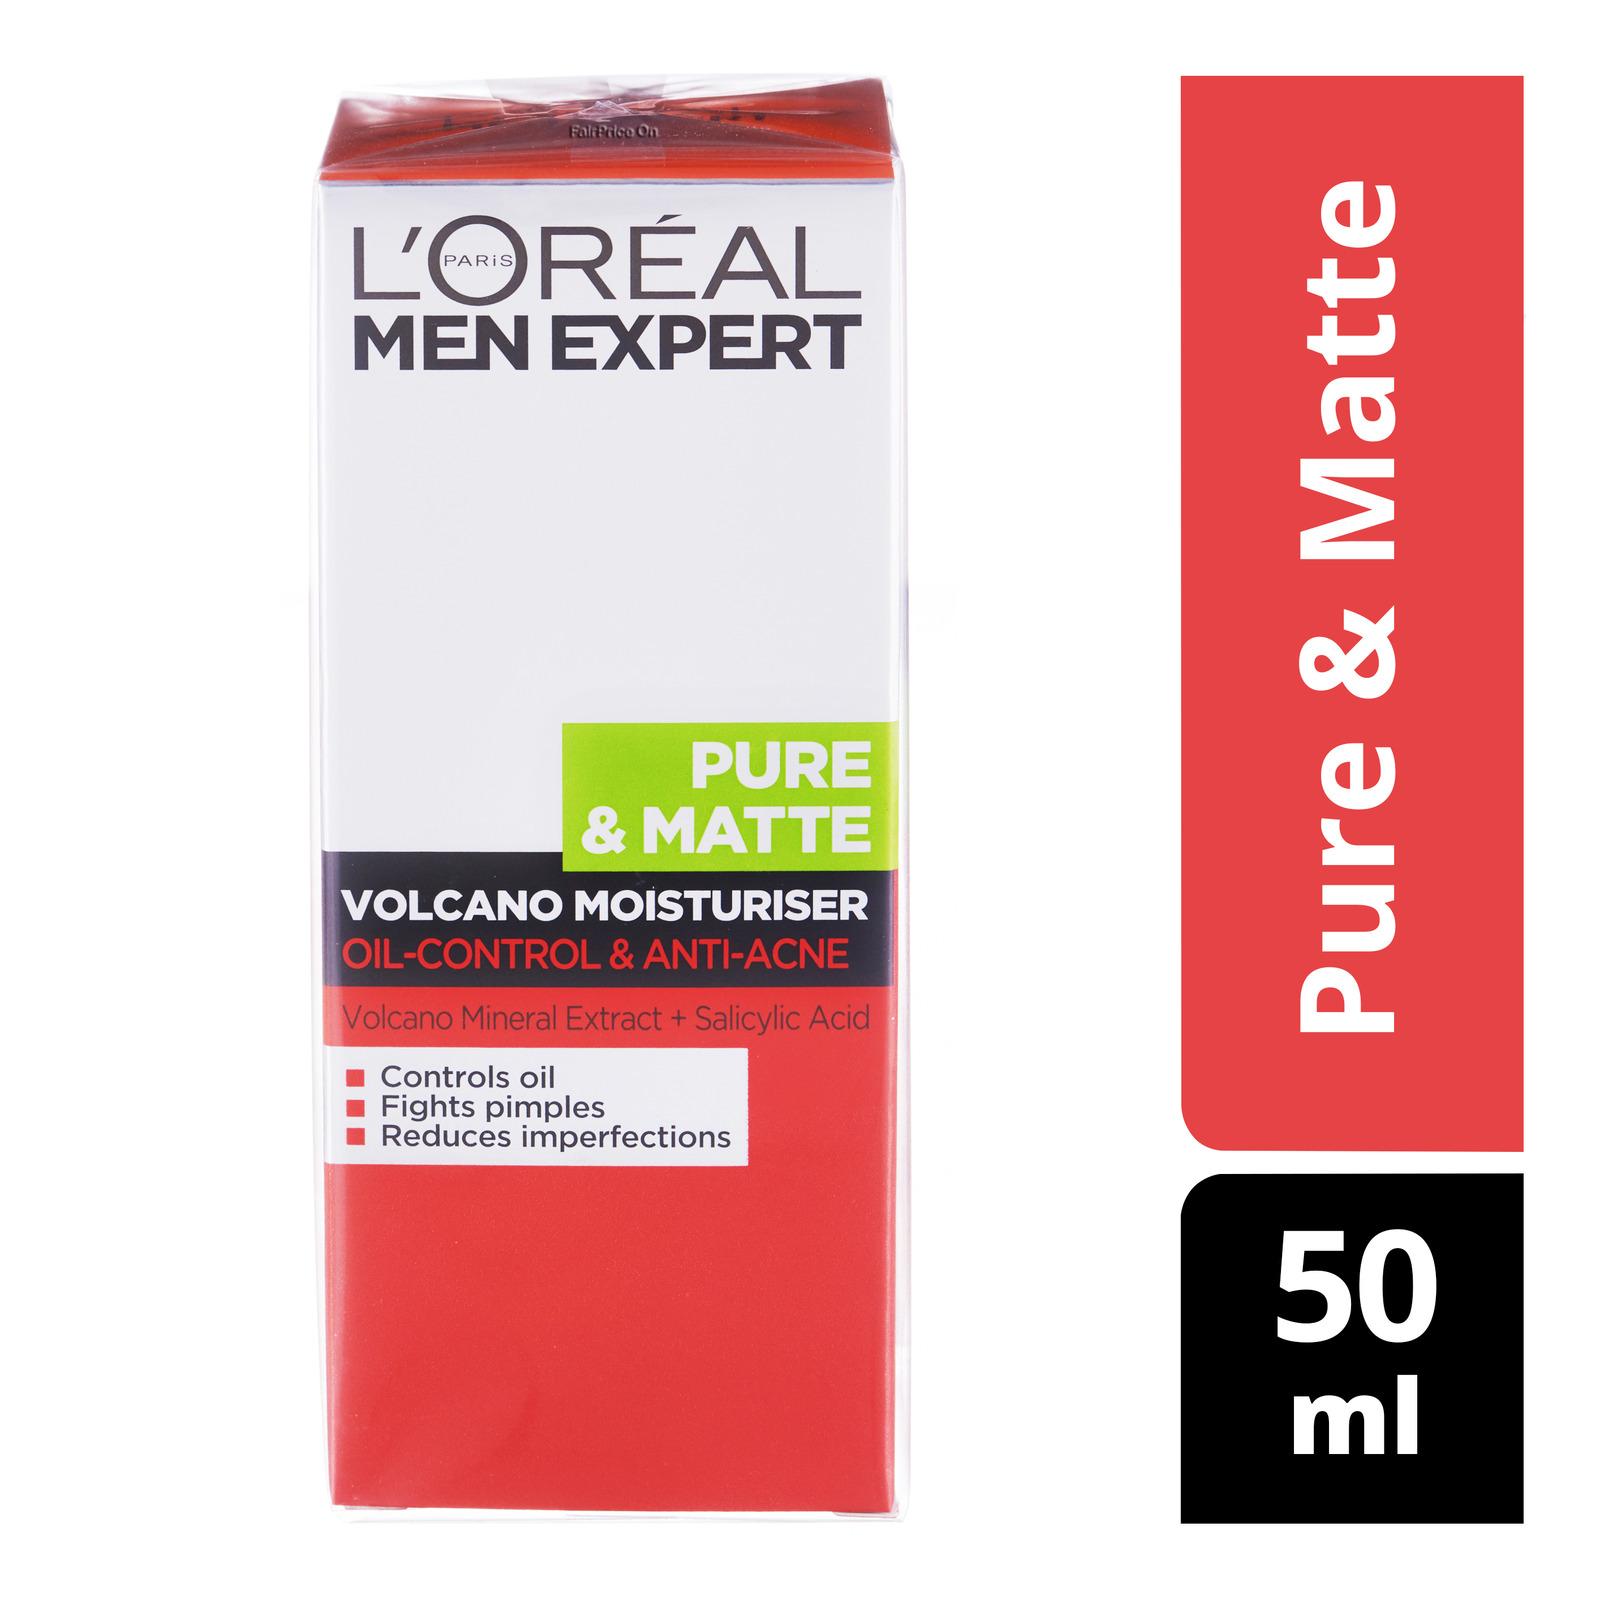 L'Oreal Men Expert Volcano Moisturiser - Pure & Matte